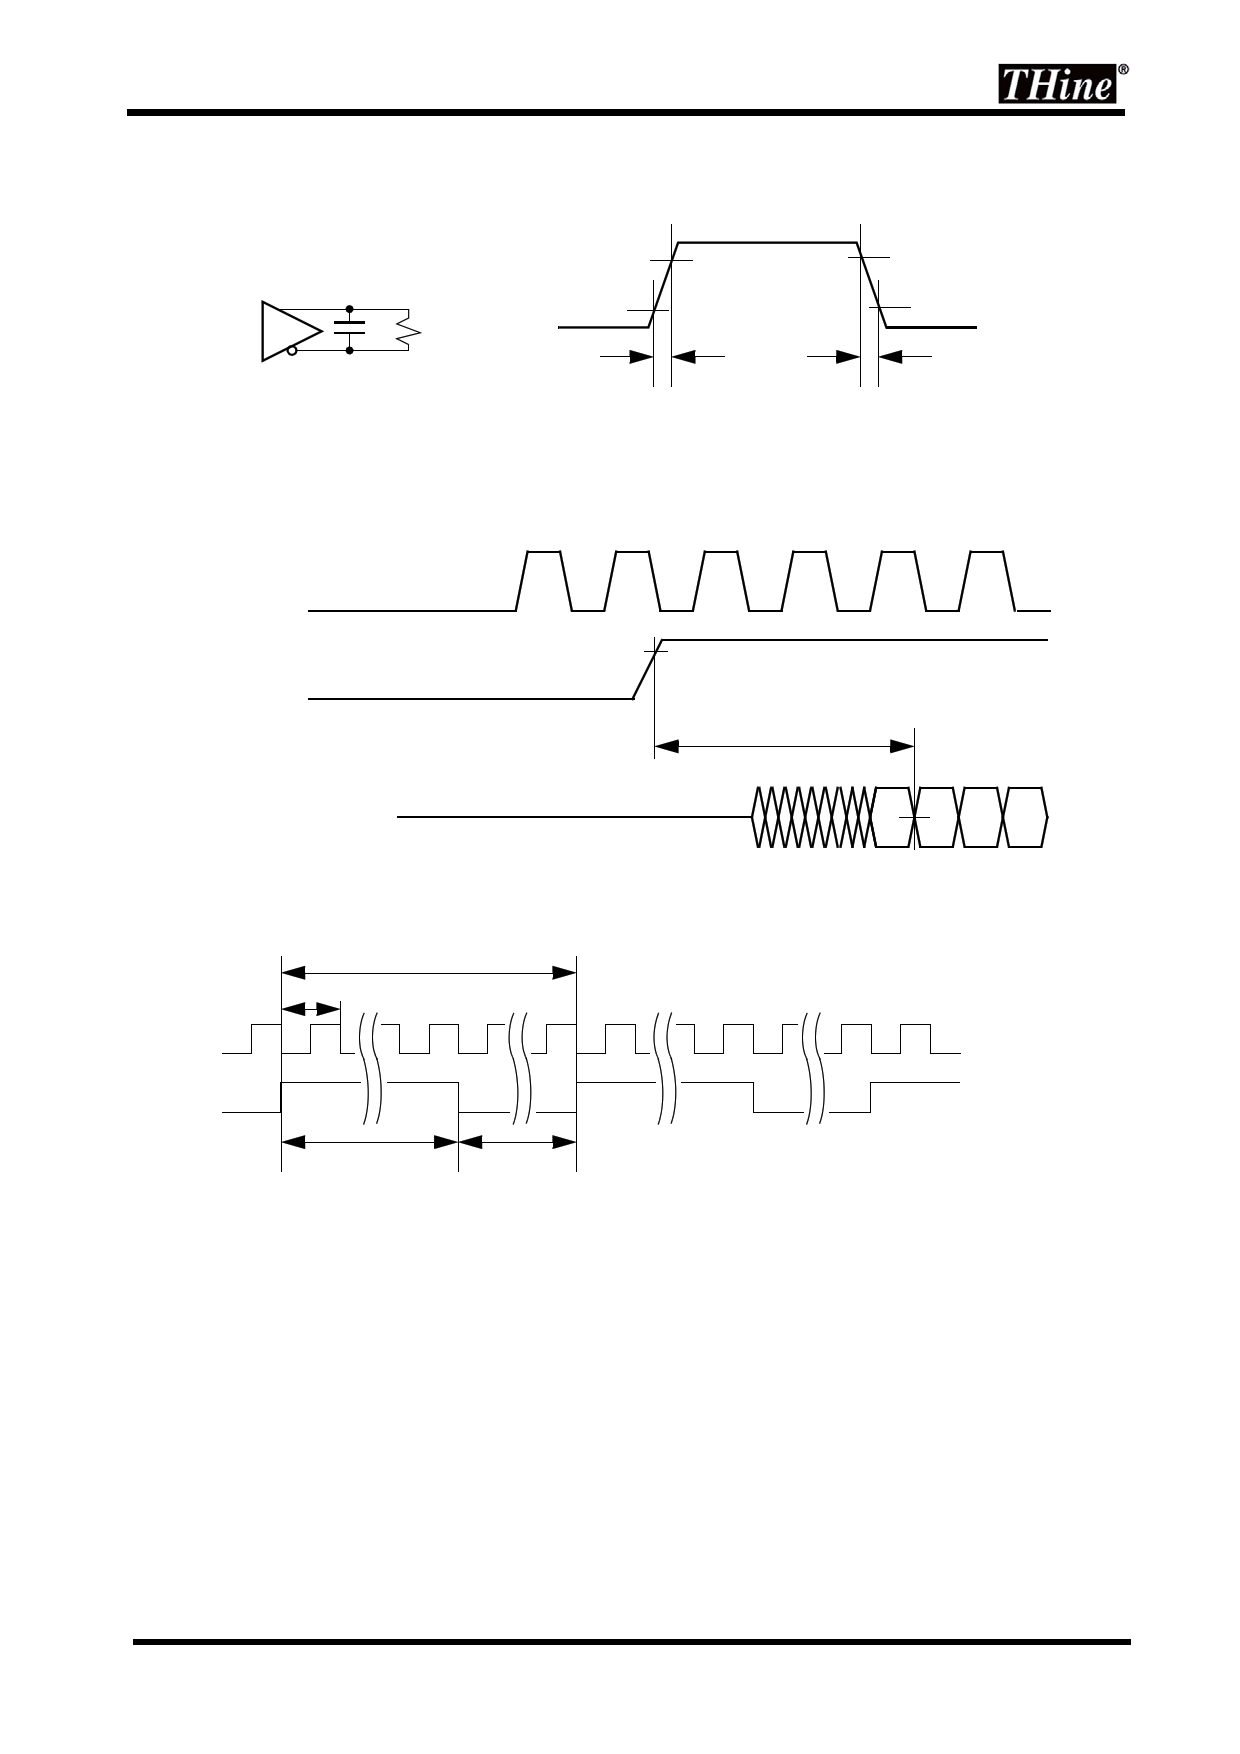 THC63LVD823B transistor, diode fet, igbt, scr